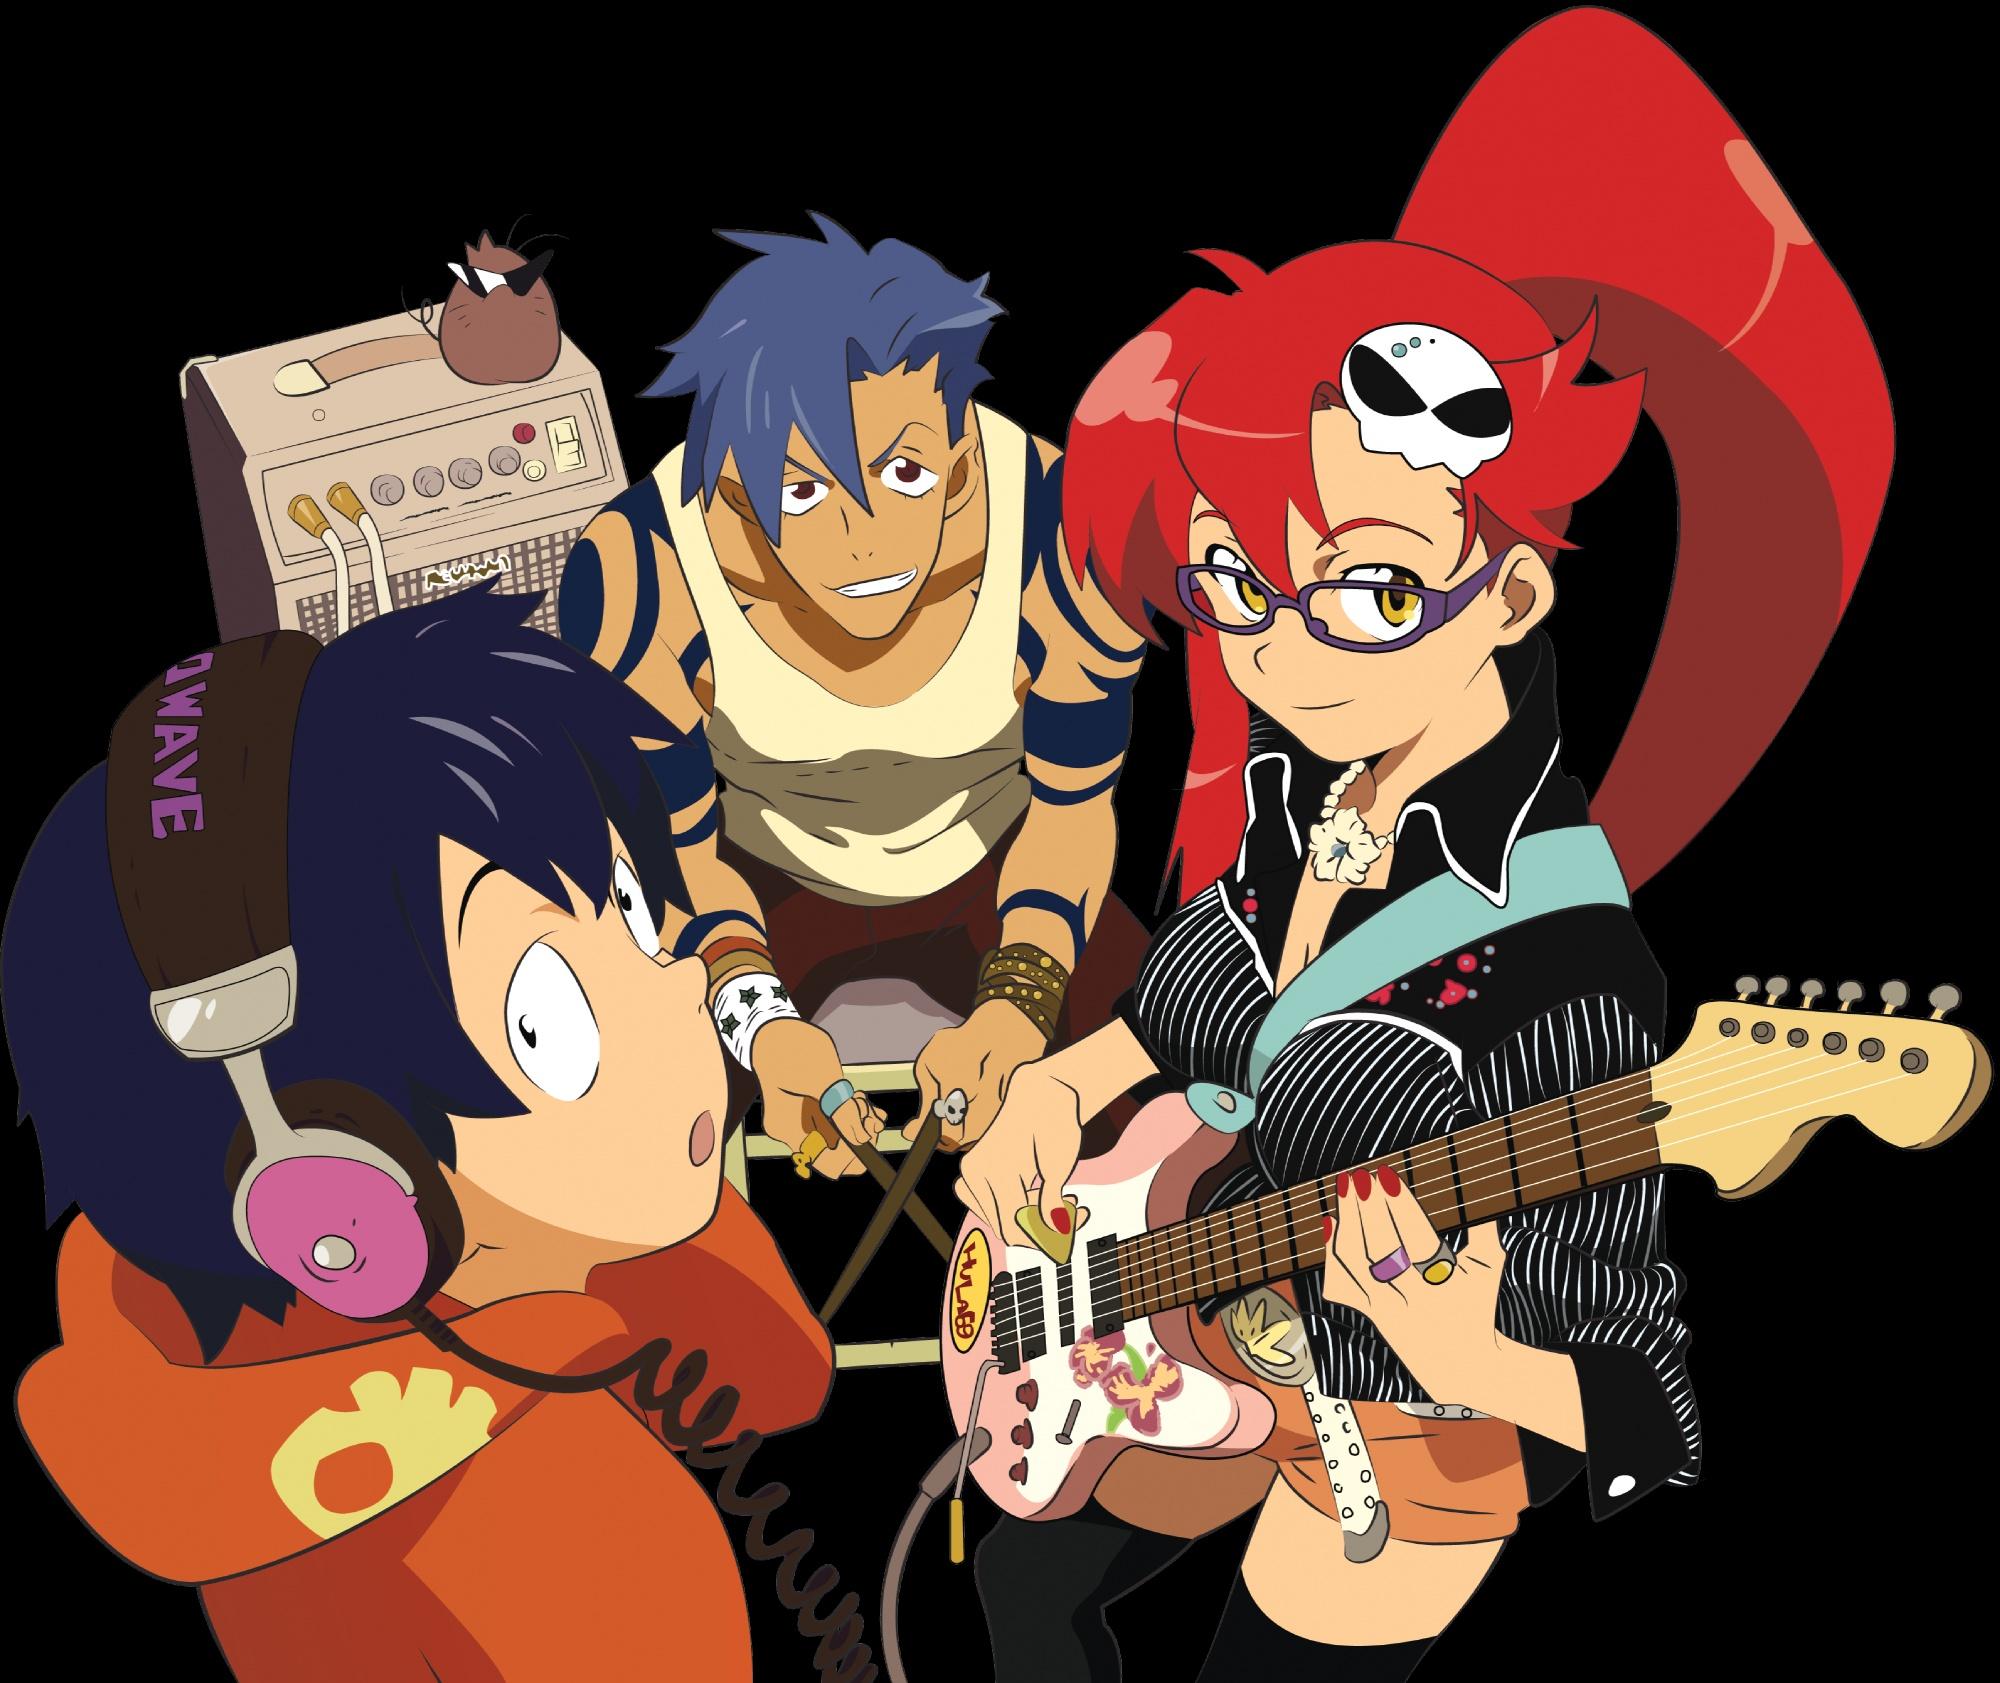 boota guitar headphones instrument kamina male simon tagme tagme_(artist) tengen_toppa_gurren_lagann yoko_littner